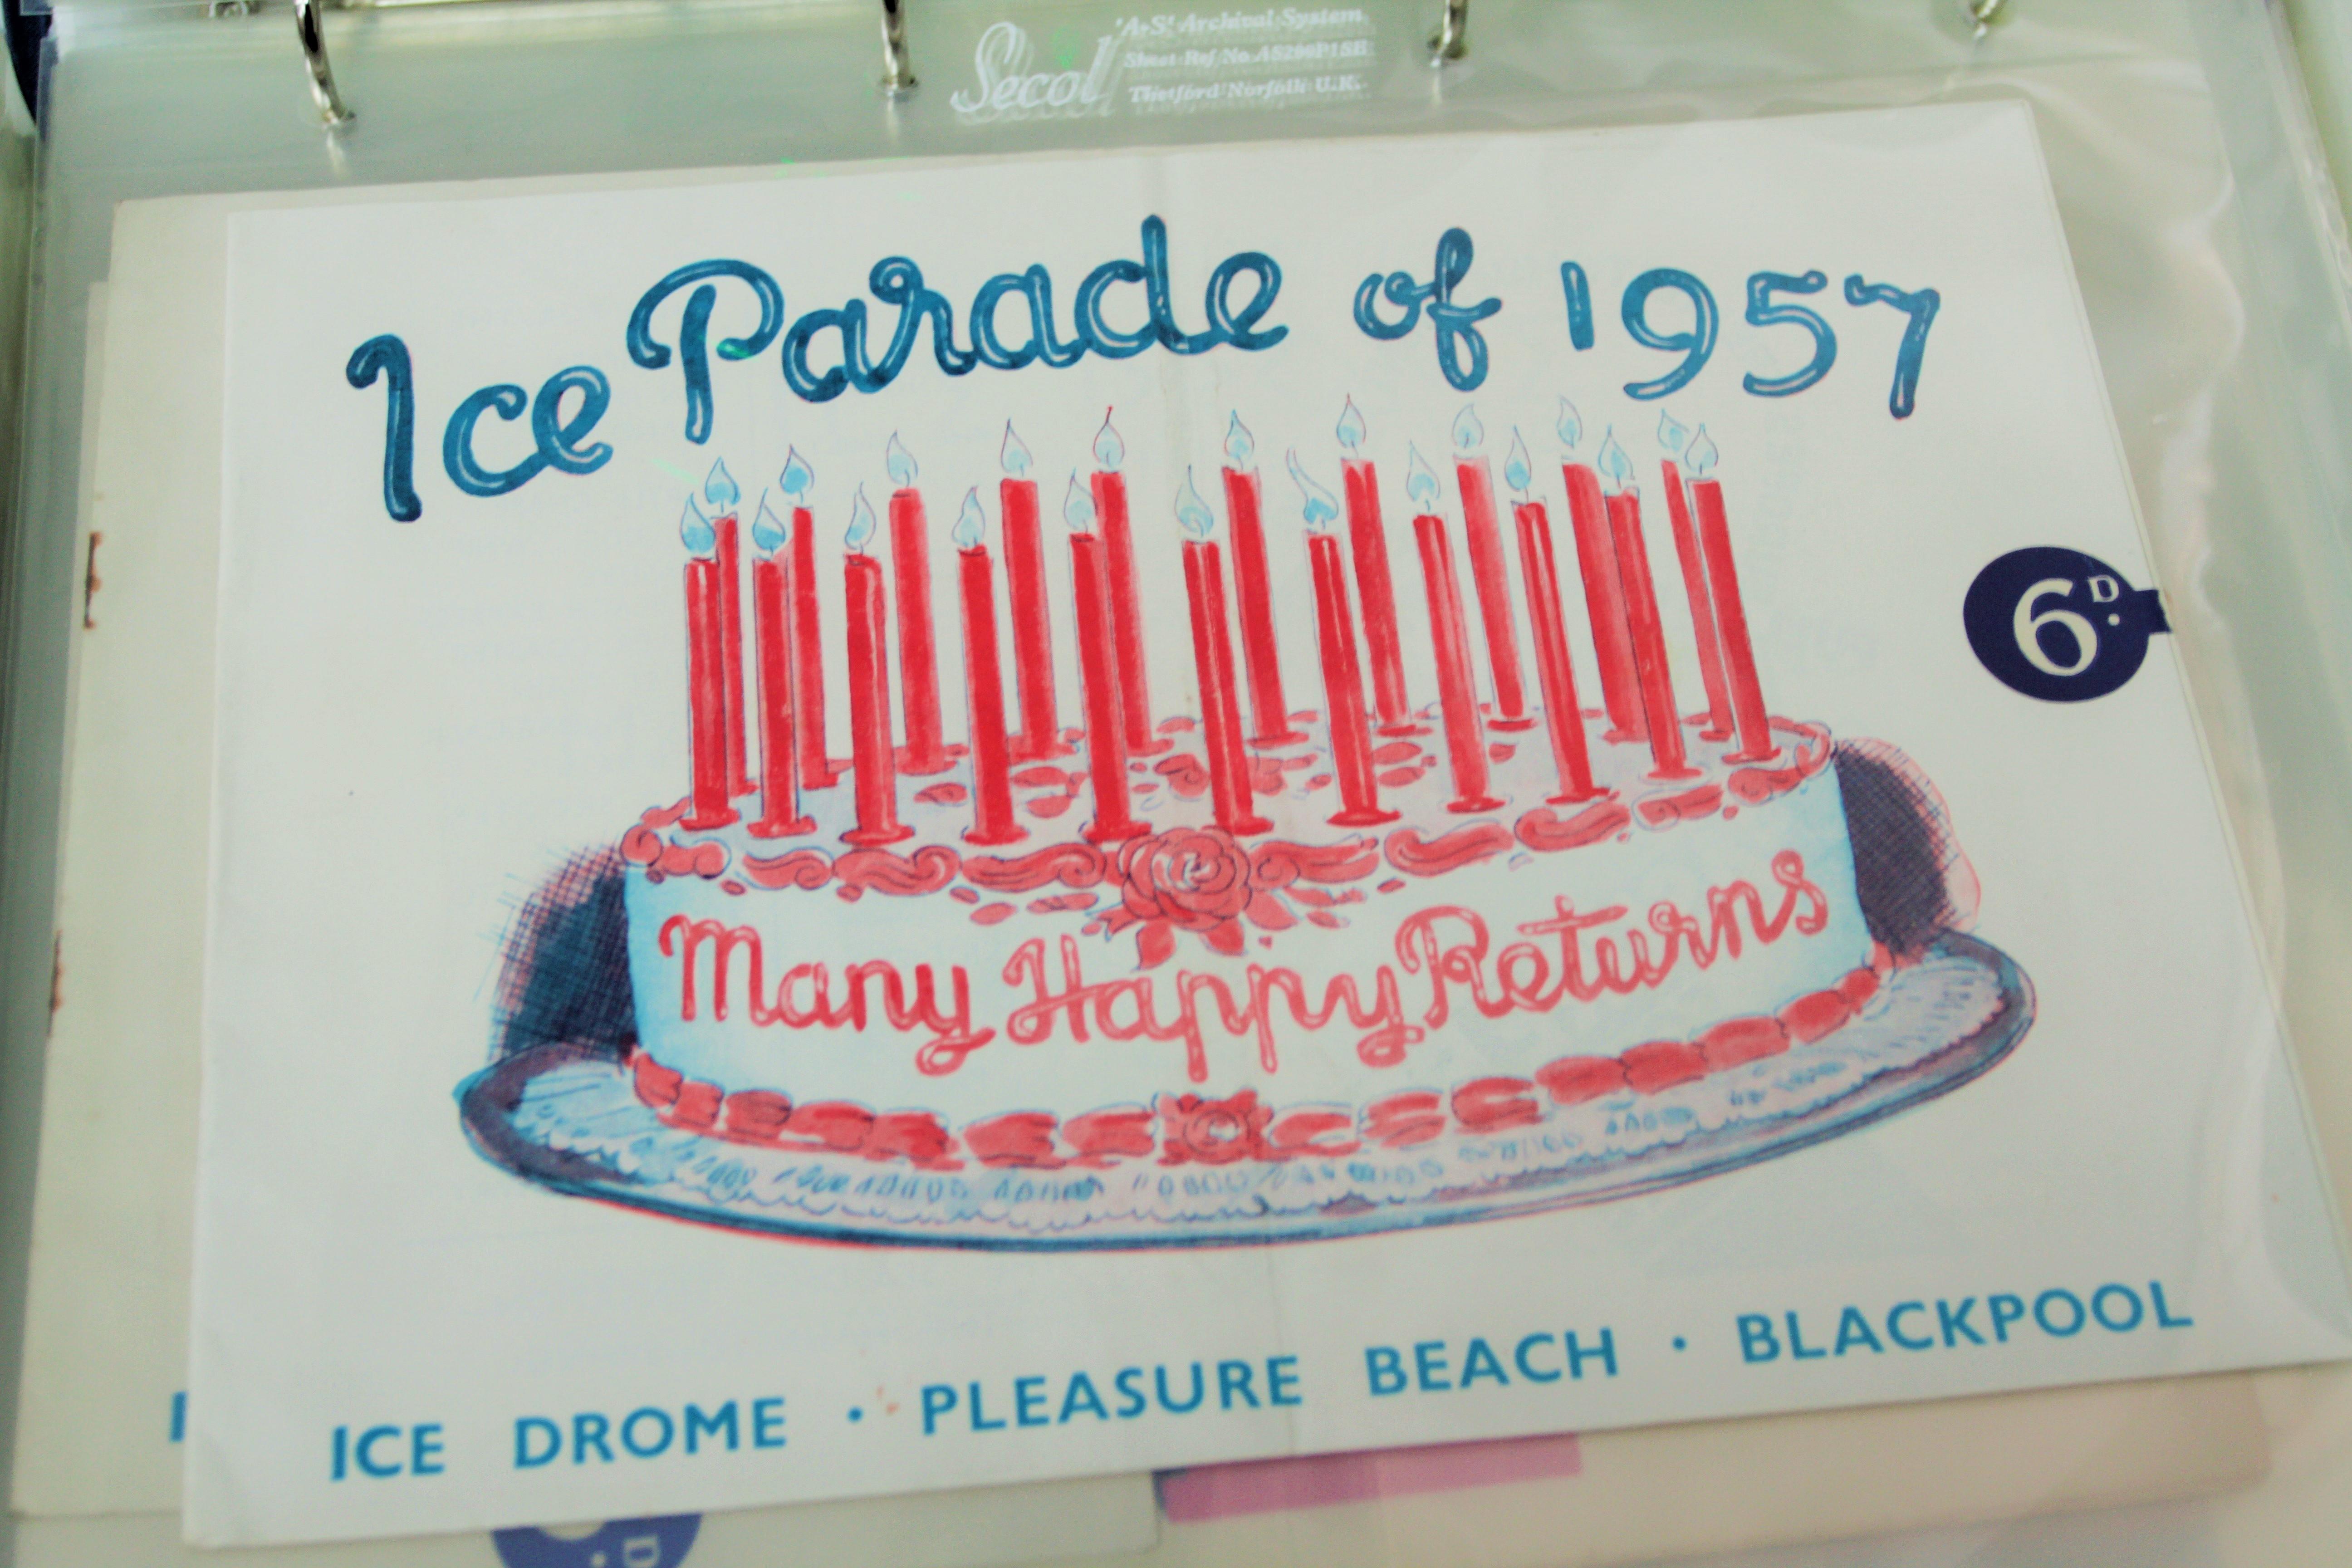 Blackpool pleasure beach ice shows